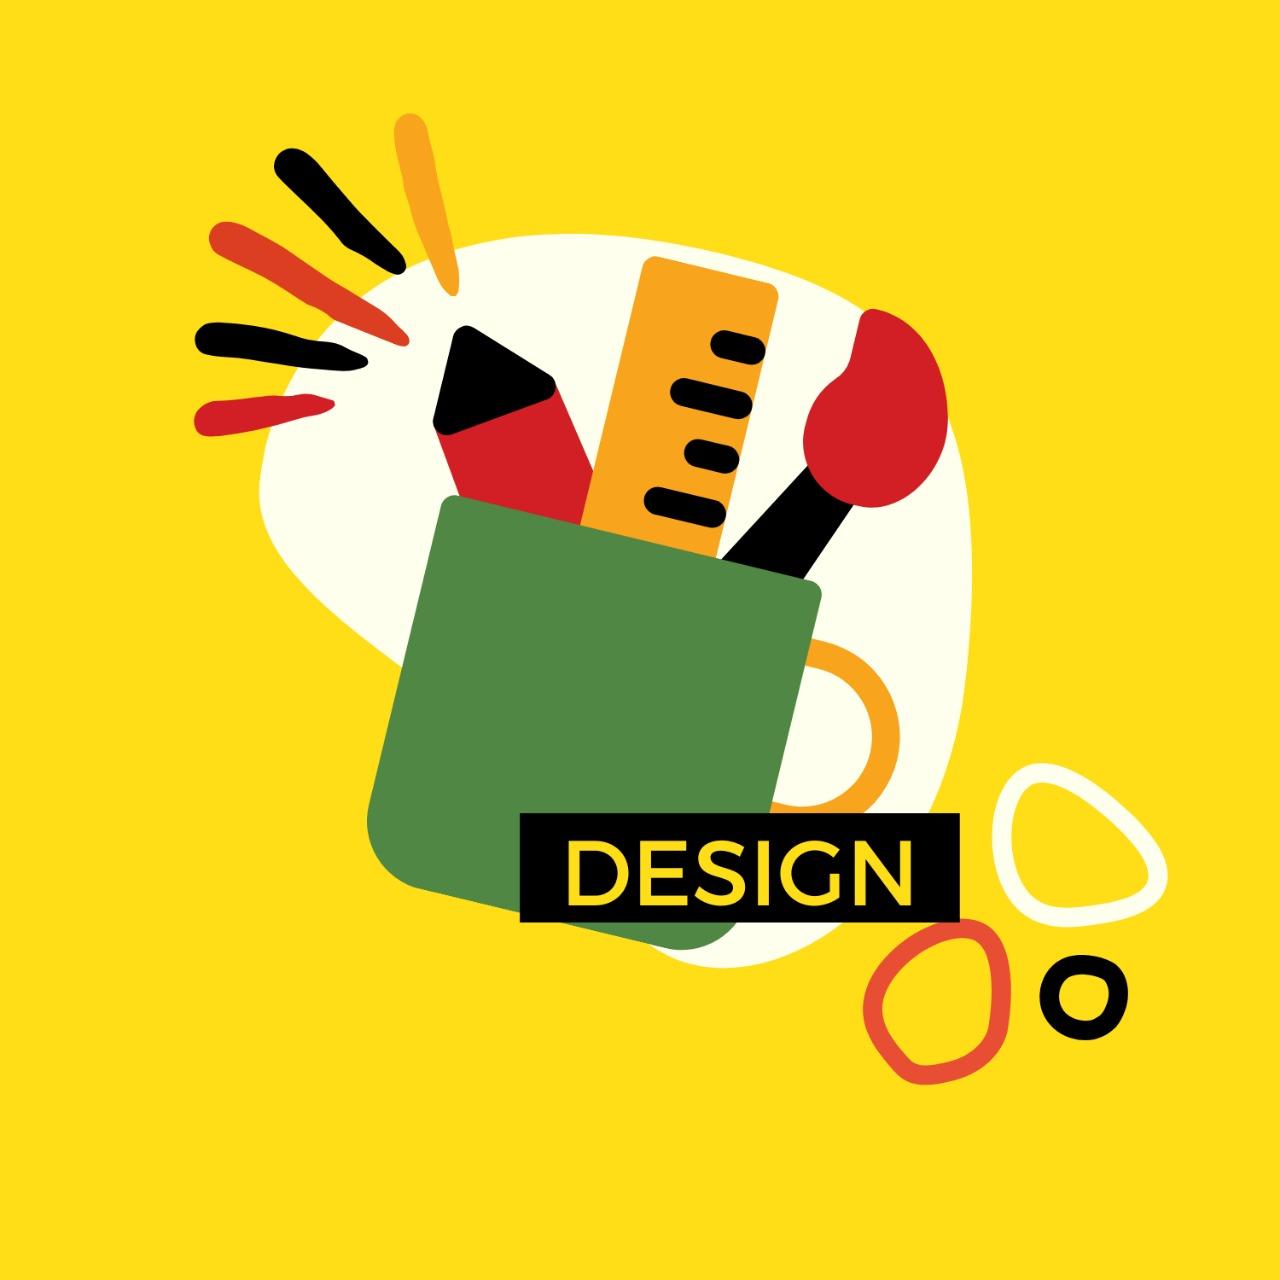 Design & #supportlocal